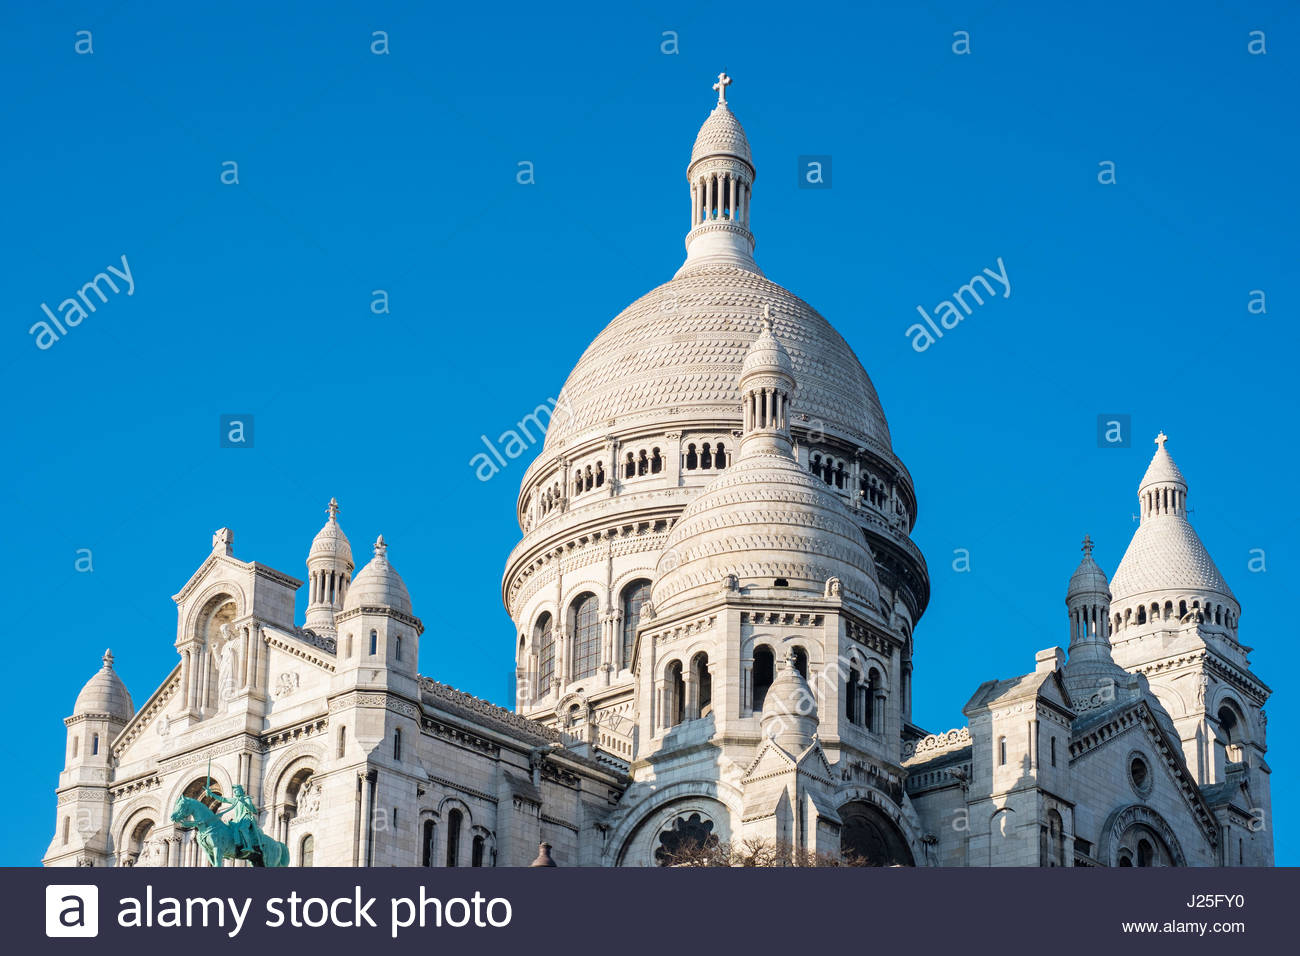 Francia, Île-de-France, París. Basílica de Sacré Coeur y Montmartre. Imagen De Stock